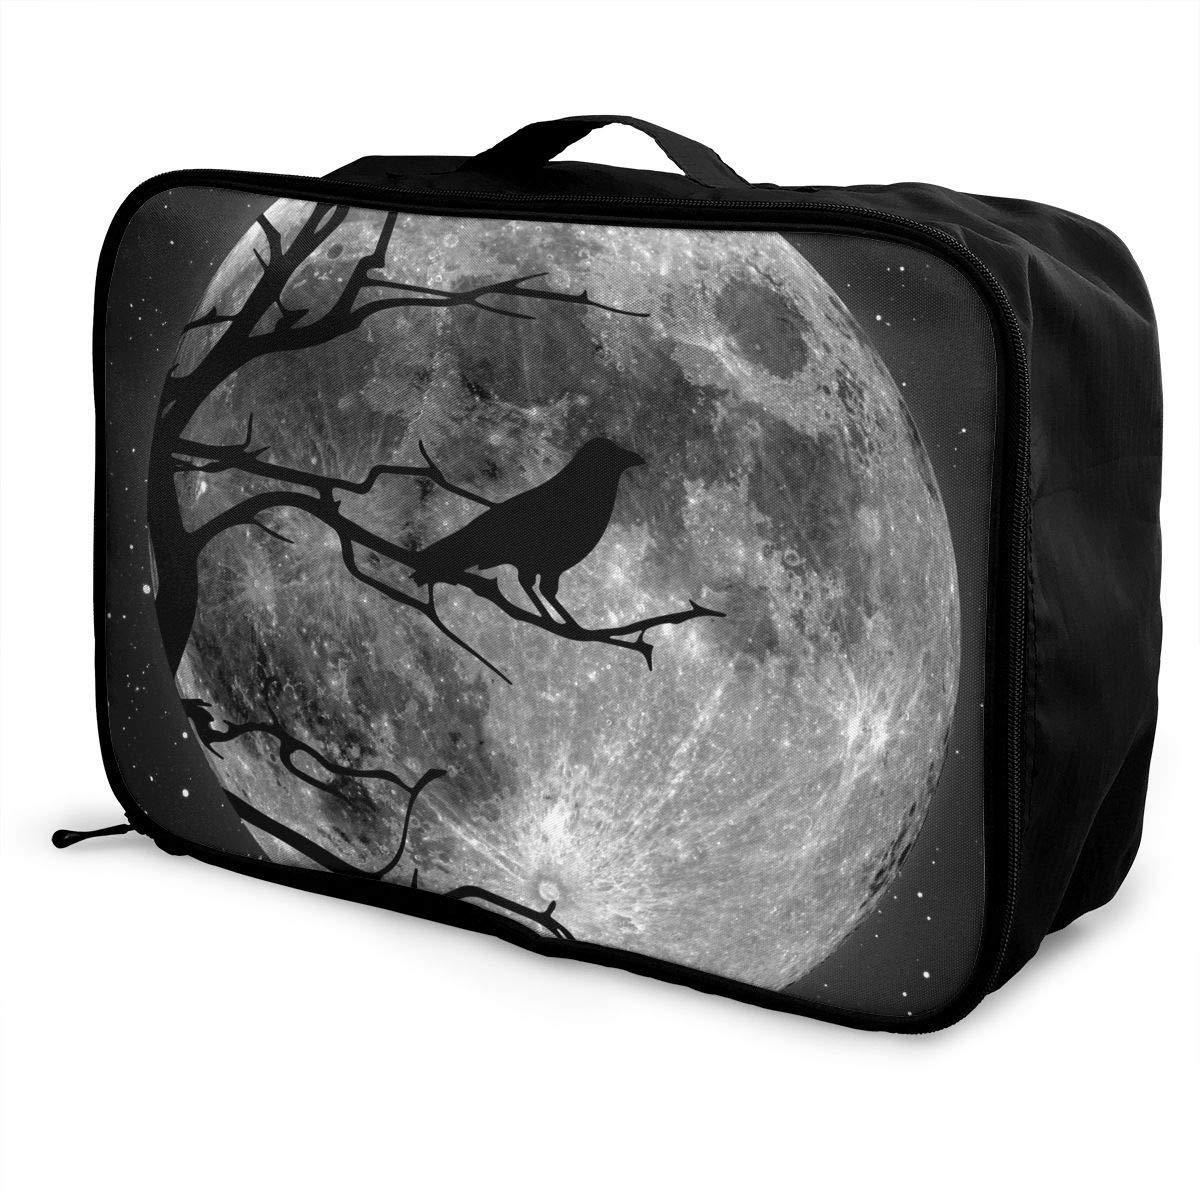 e6cf40260e36 Amazon.com: Crow Luggage Bag Capacity Portable Large Toiletry Bag ...